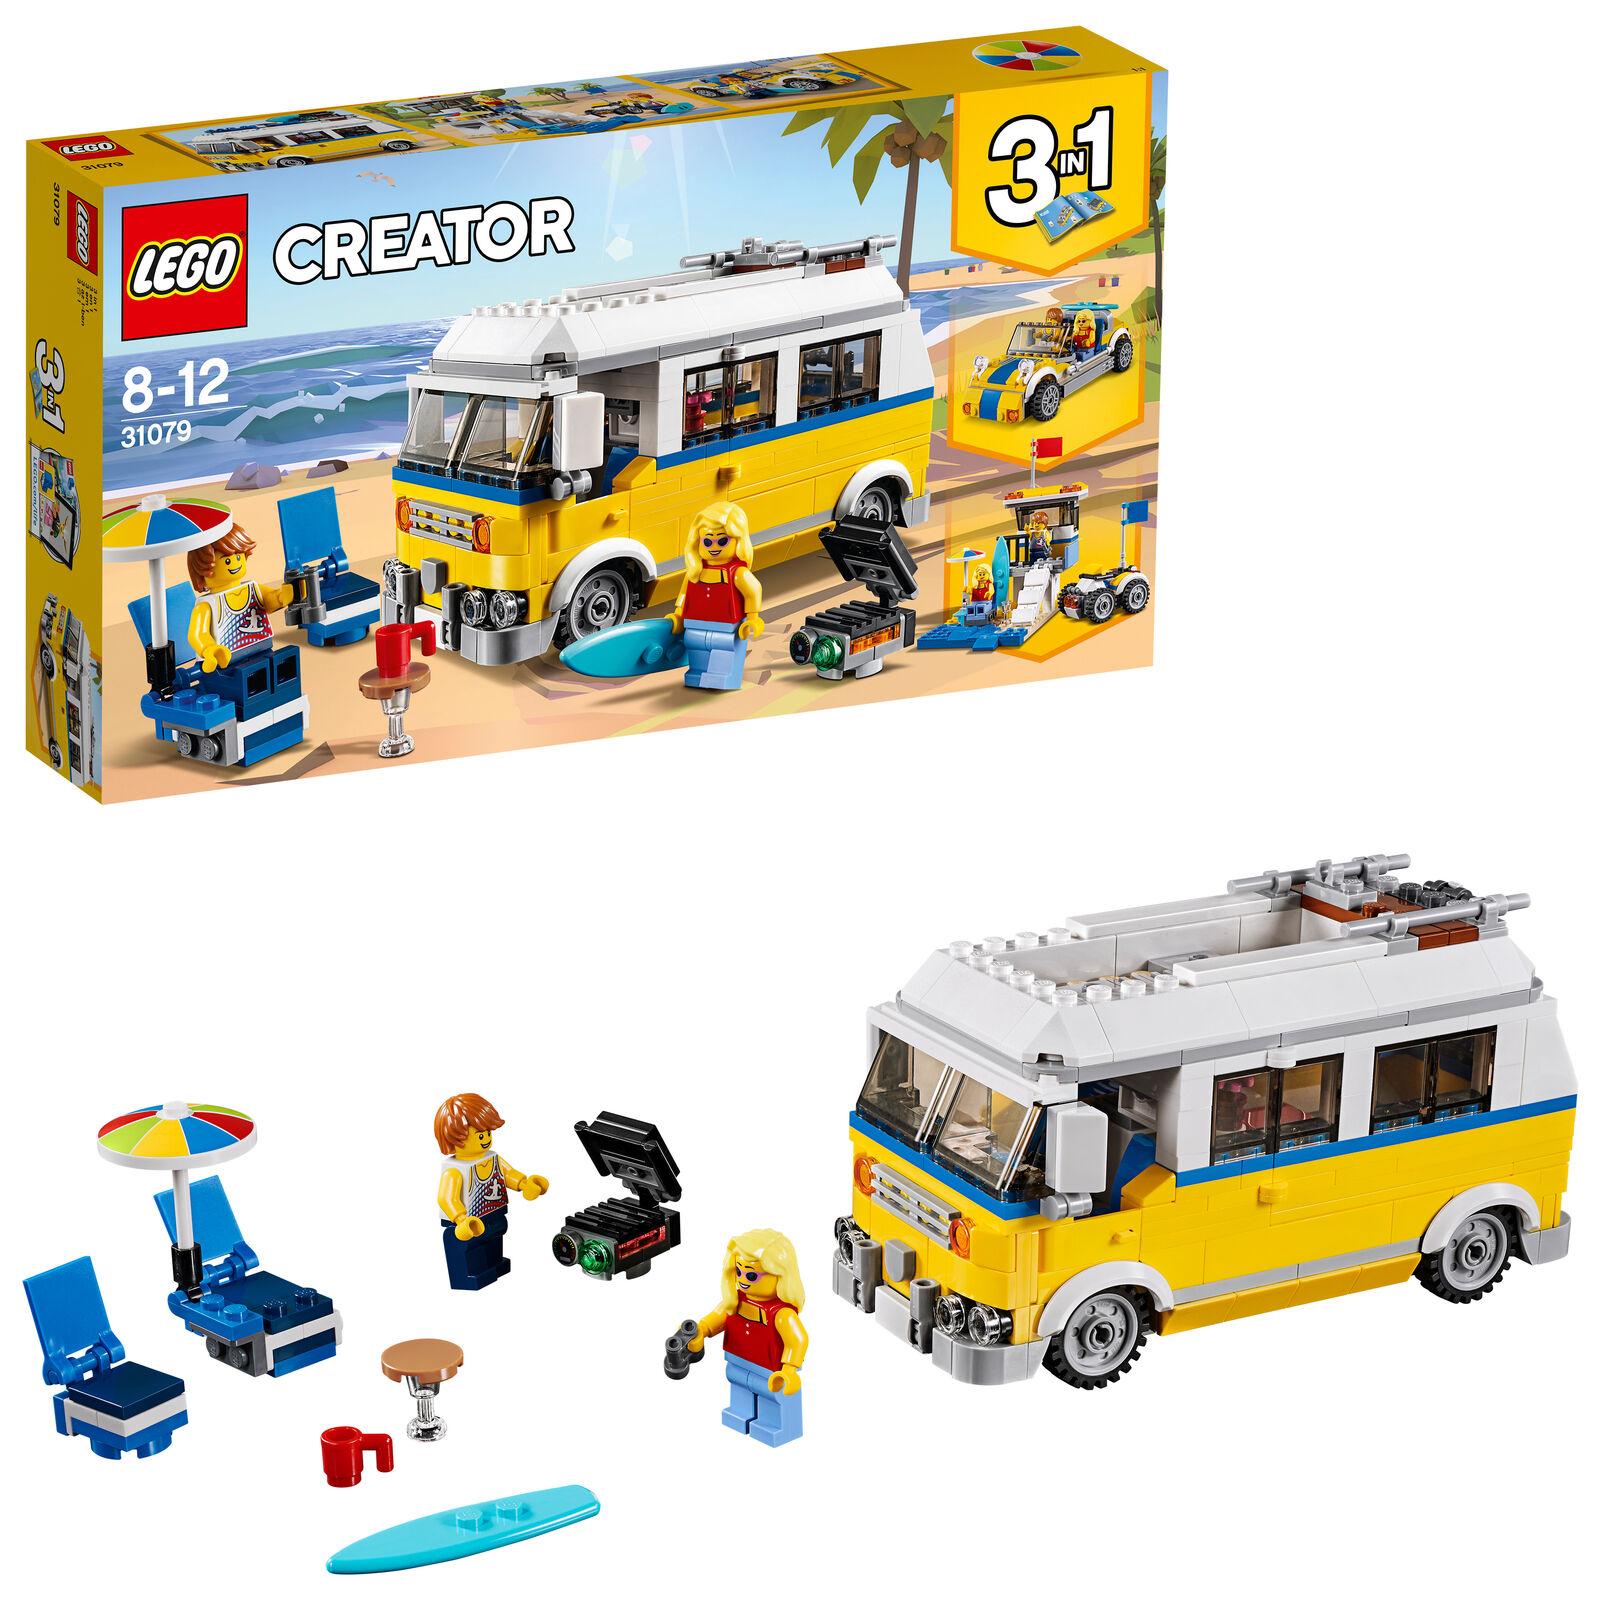 LEGO Creator - Surfermobil (31079) (31079) Surfermobil 71474d